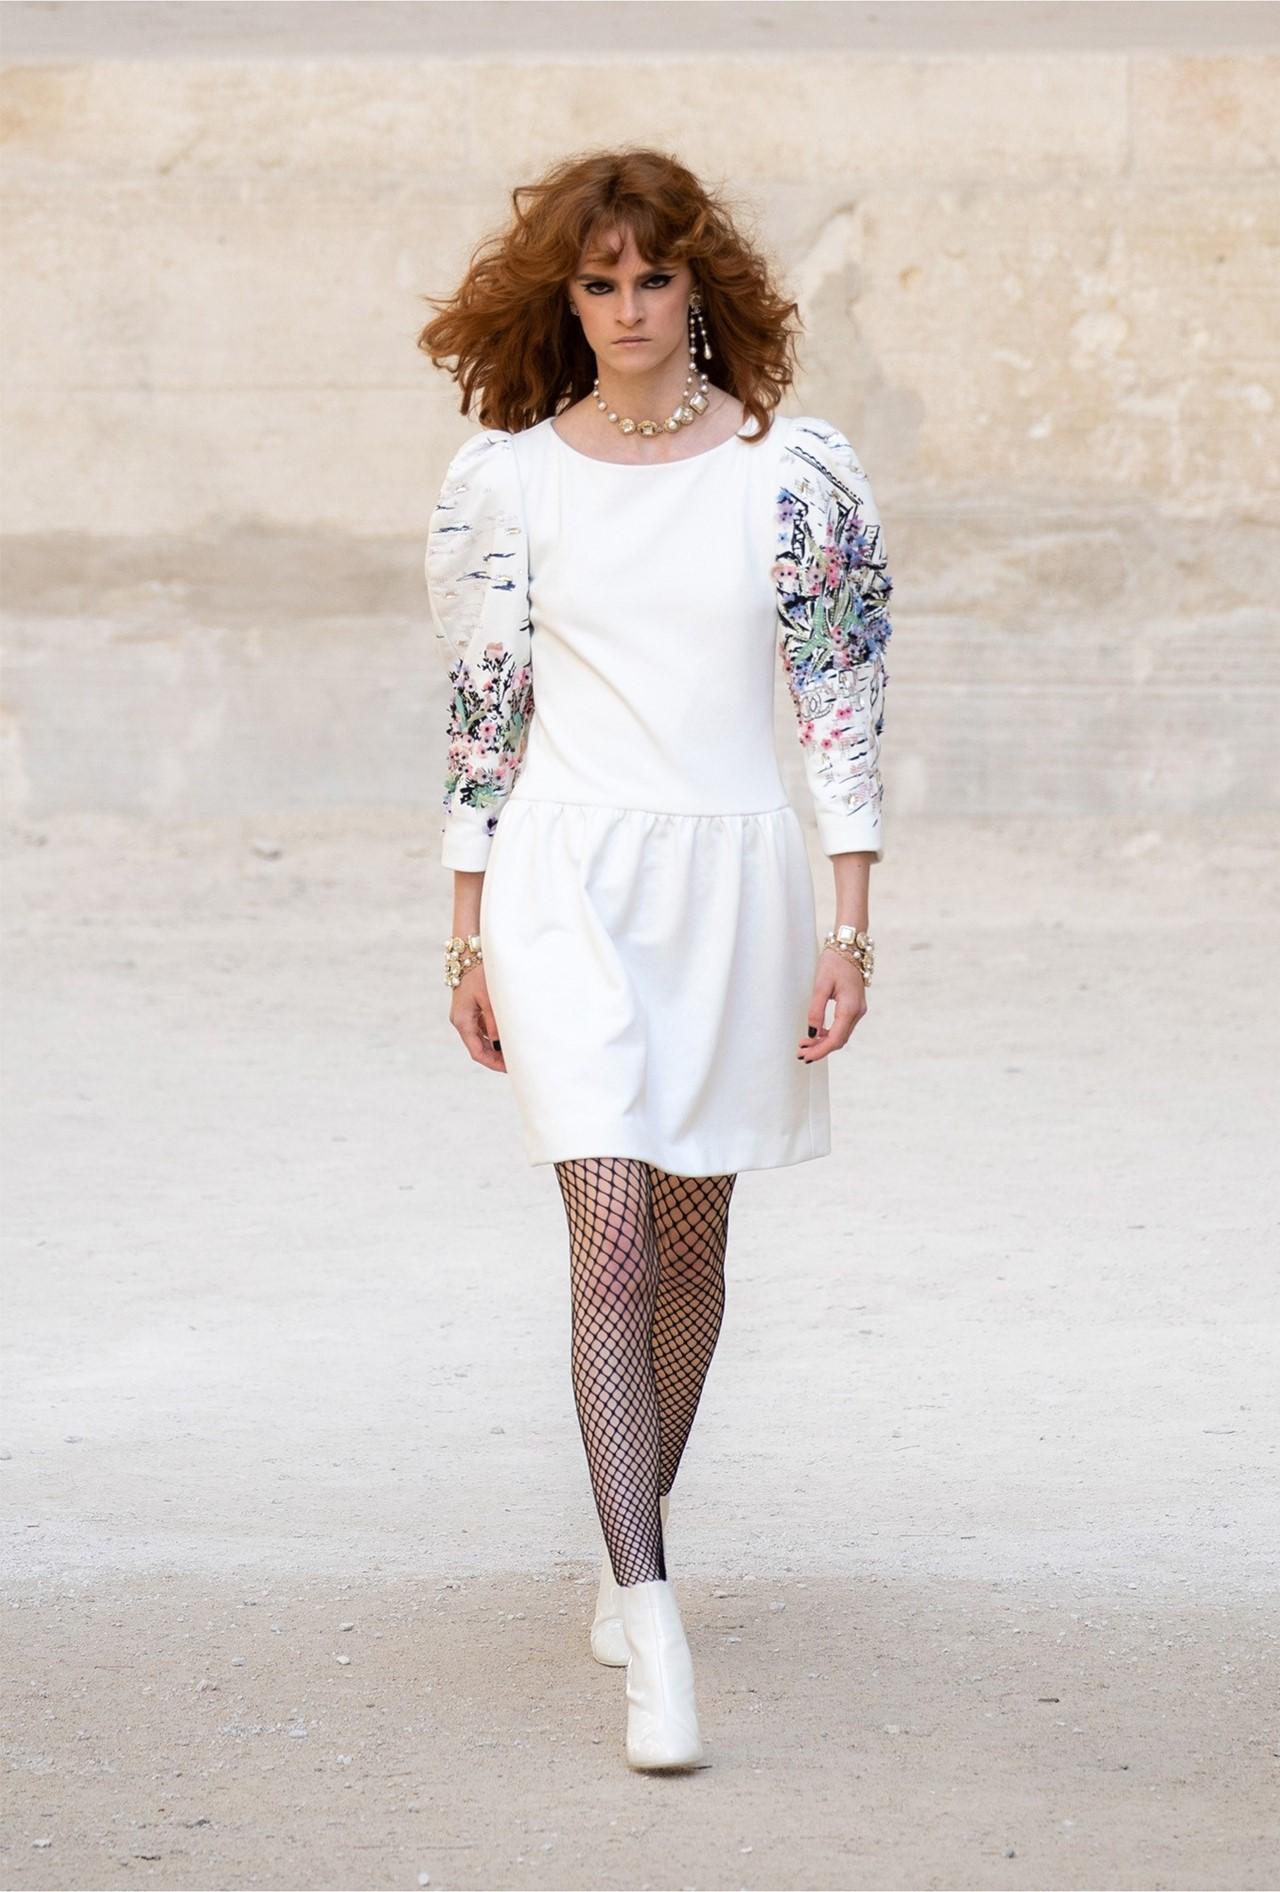 Chanel_Cruise_2022_Fashionela (40)